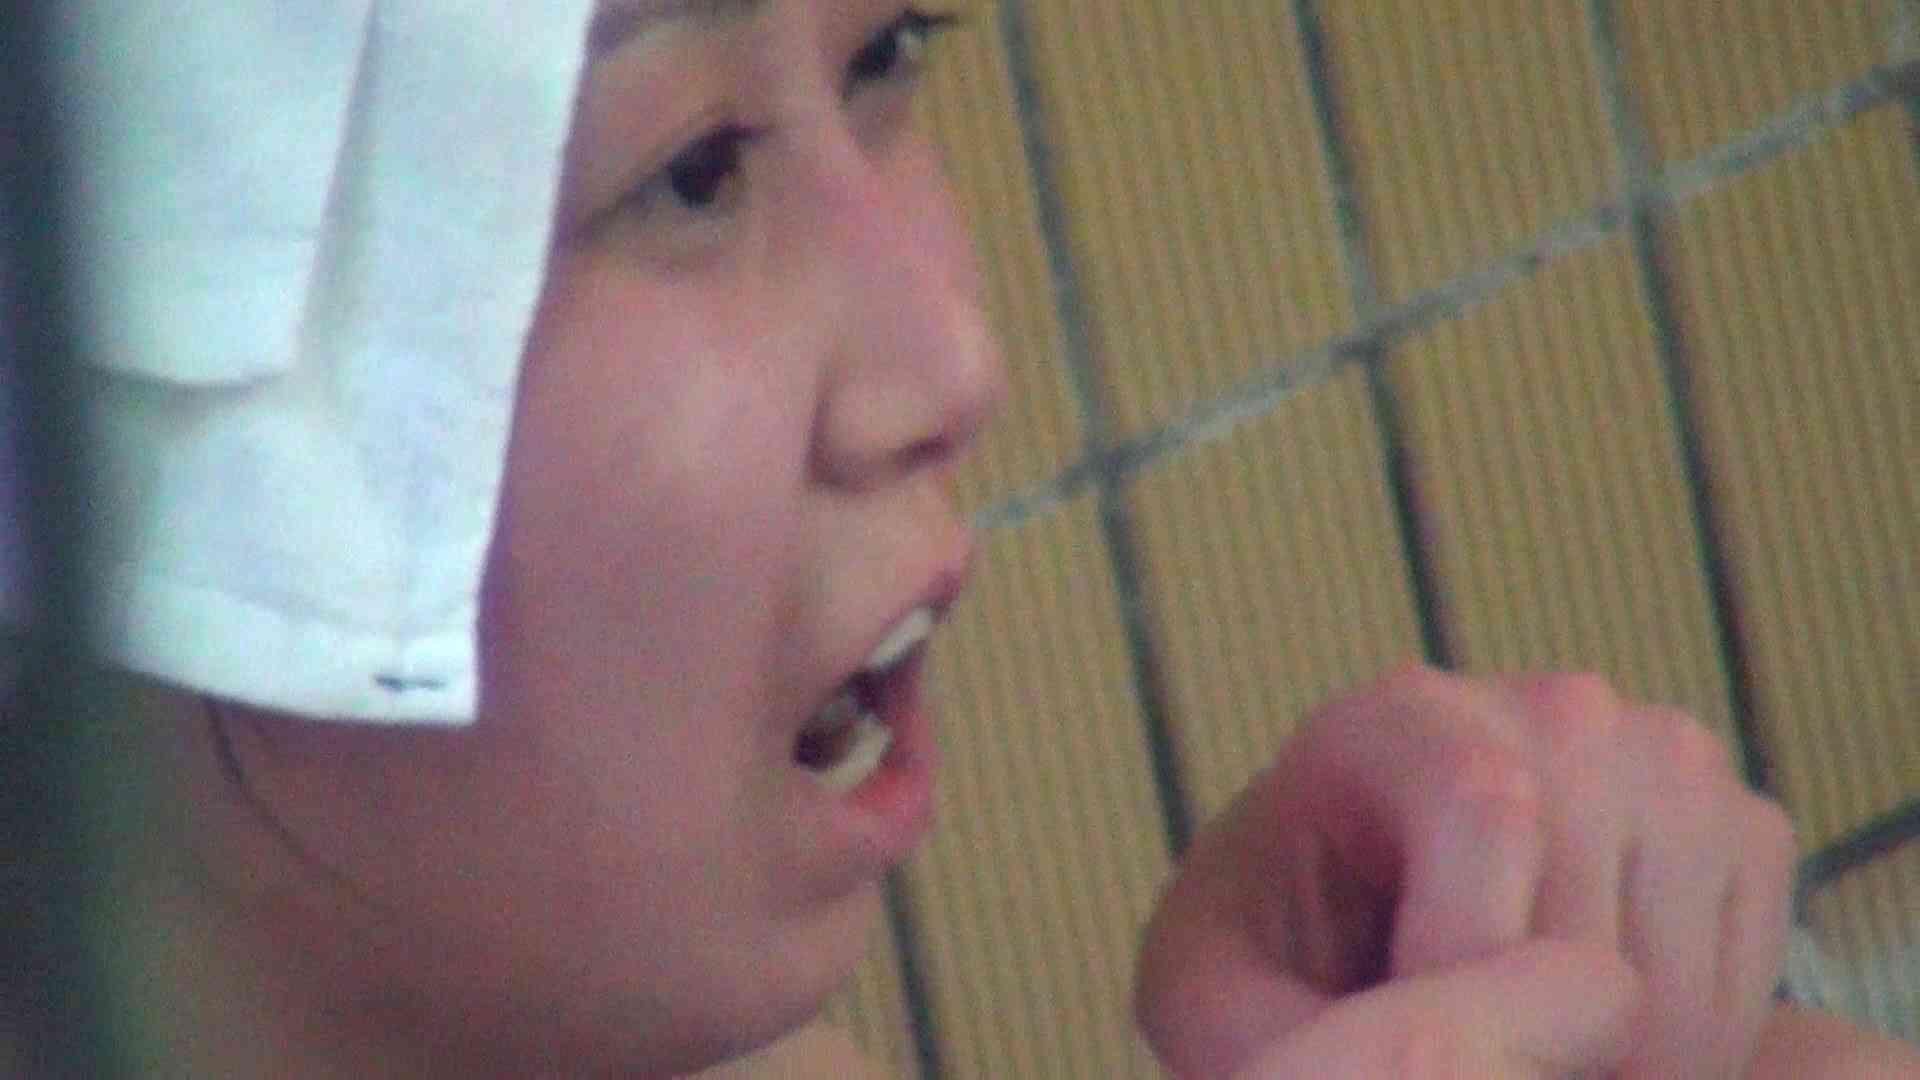 Vol.44 アラサー三人露天風呂女子会開催中 細身女性 ヌード画像 112画像 68